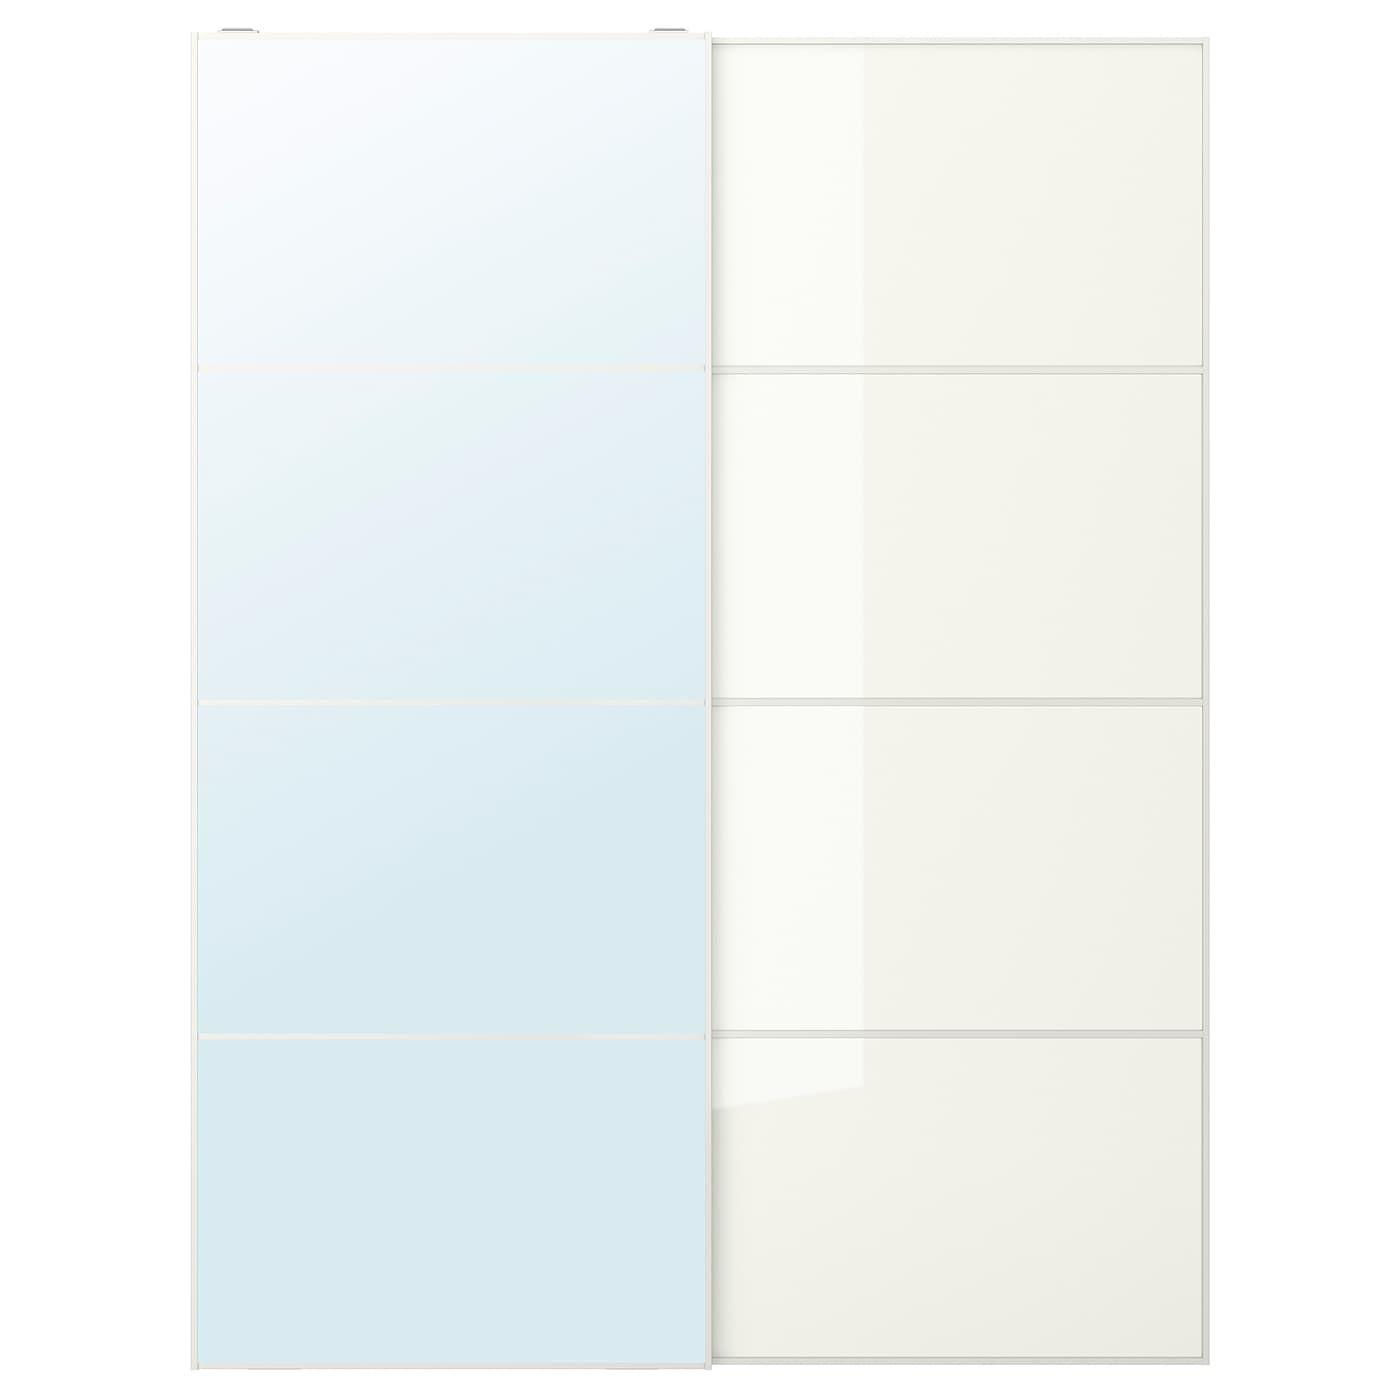 Auli Farvik Pair Of Sliding Doors Mirror Glass White Glass Shop Here Ikea In 2020 Mirror Door Sliding Doors Glass Mirror